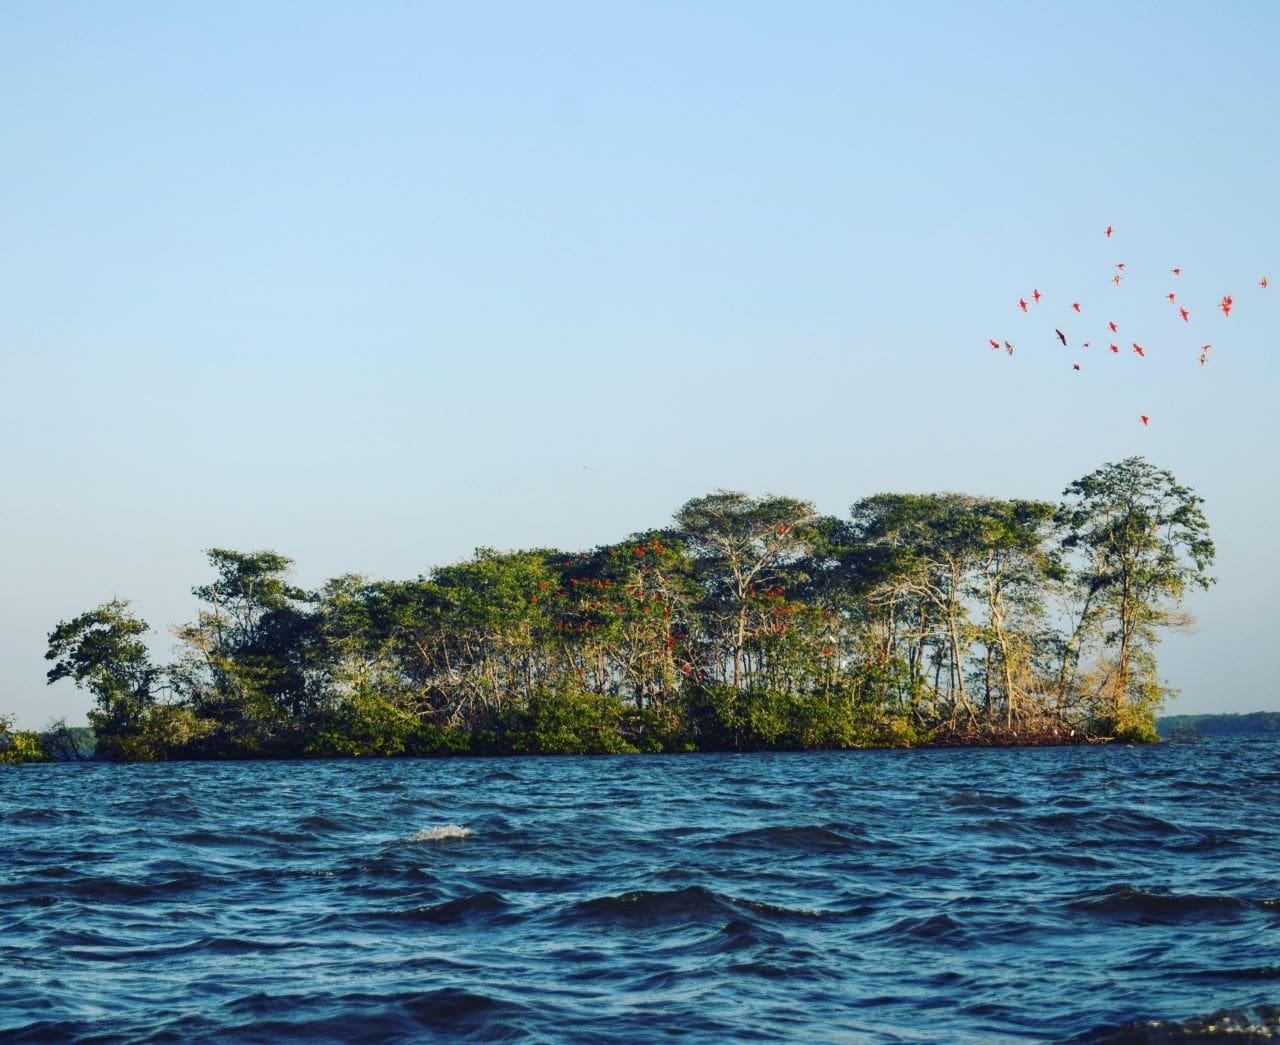 revoada no meio do delta do parnaiba